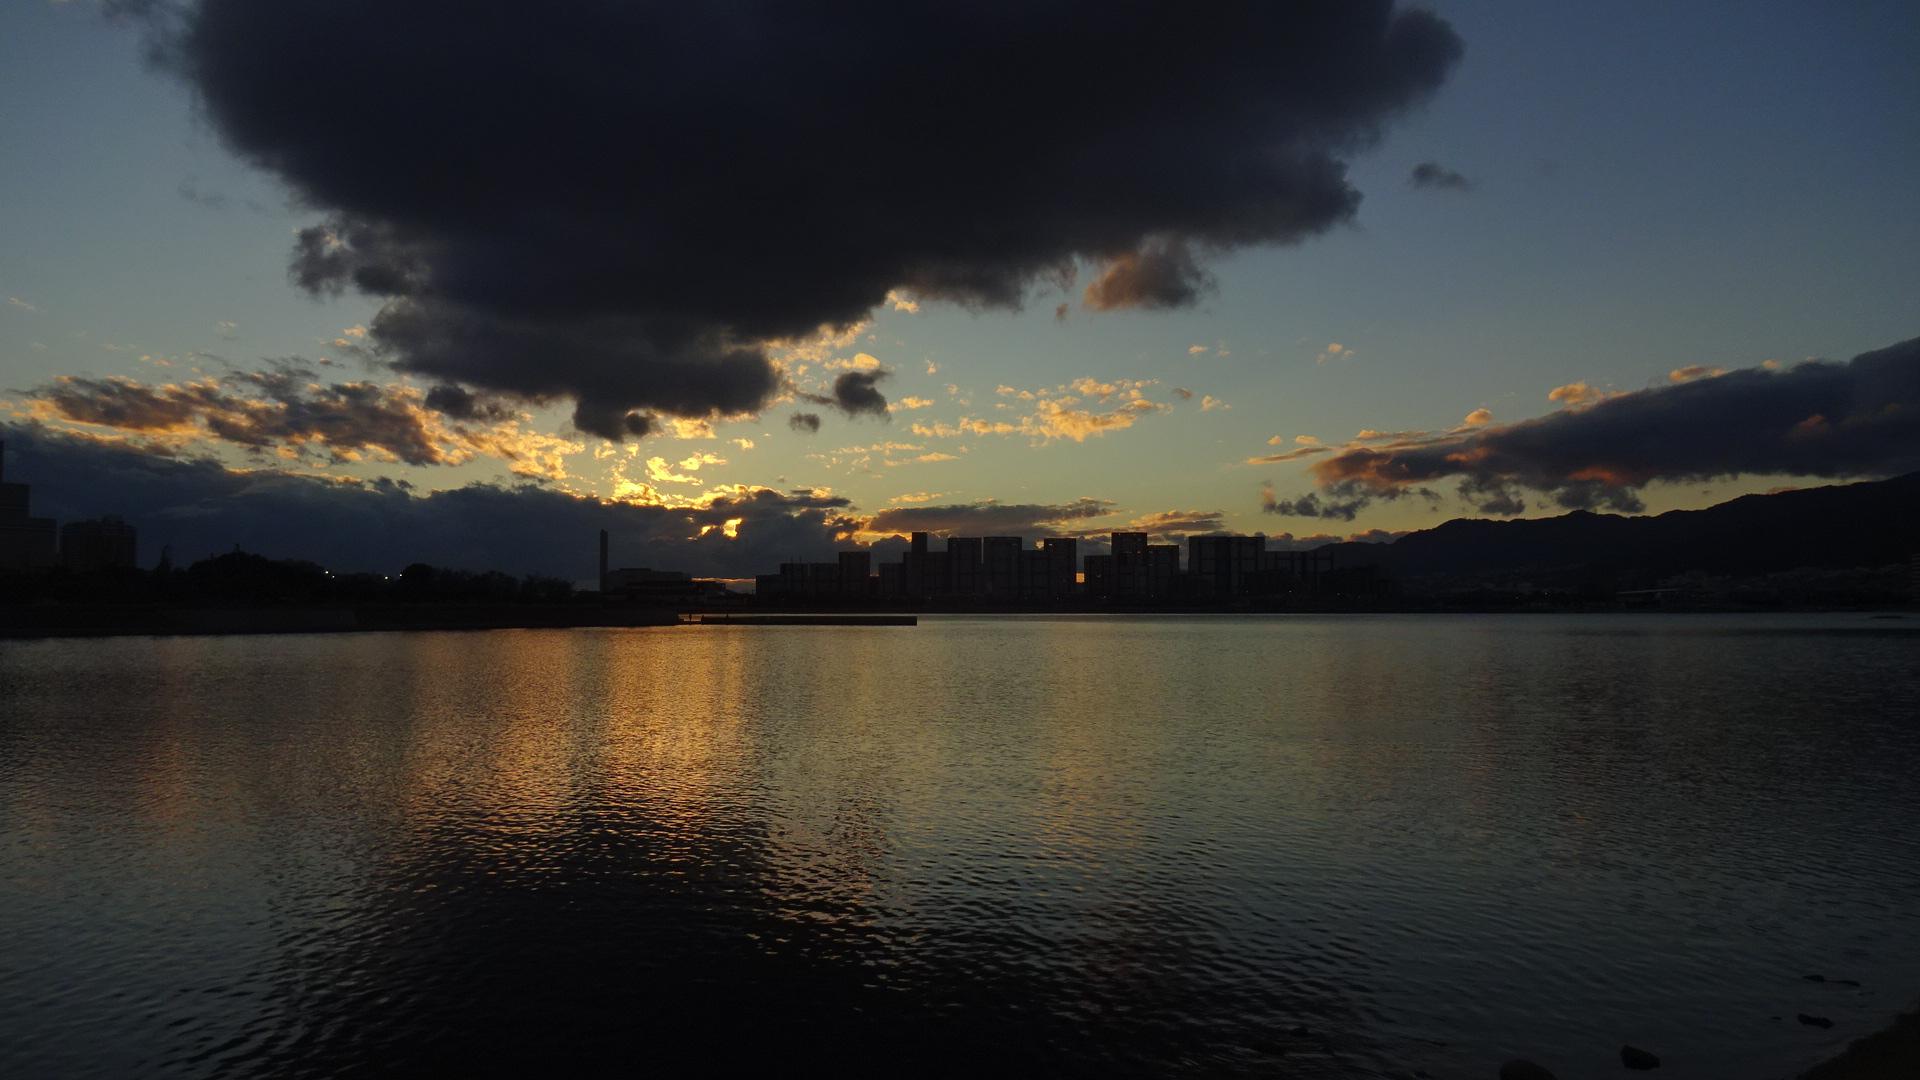 https://cdn-ak.f.st-hatena.com/images/fotolife/s/shioshiohida/20181122/20181122163537_original.jpg